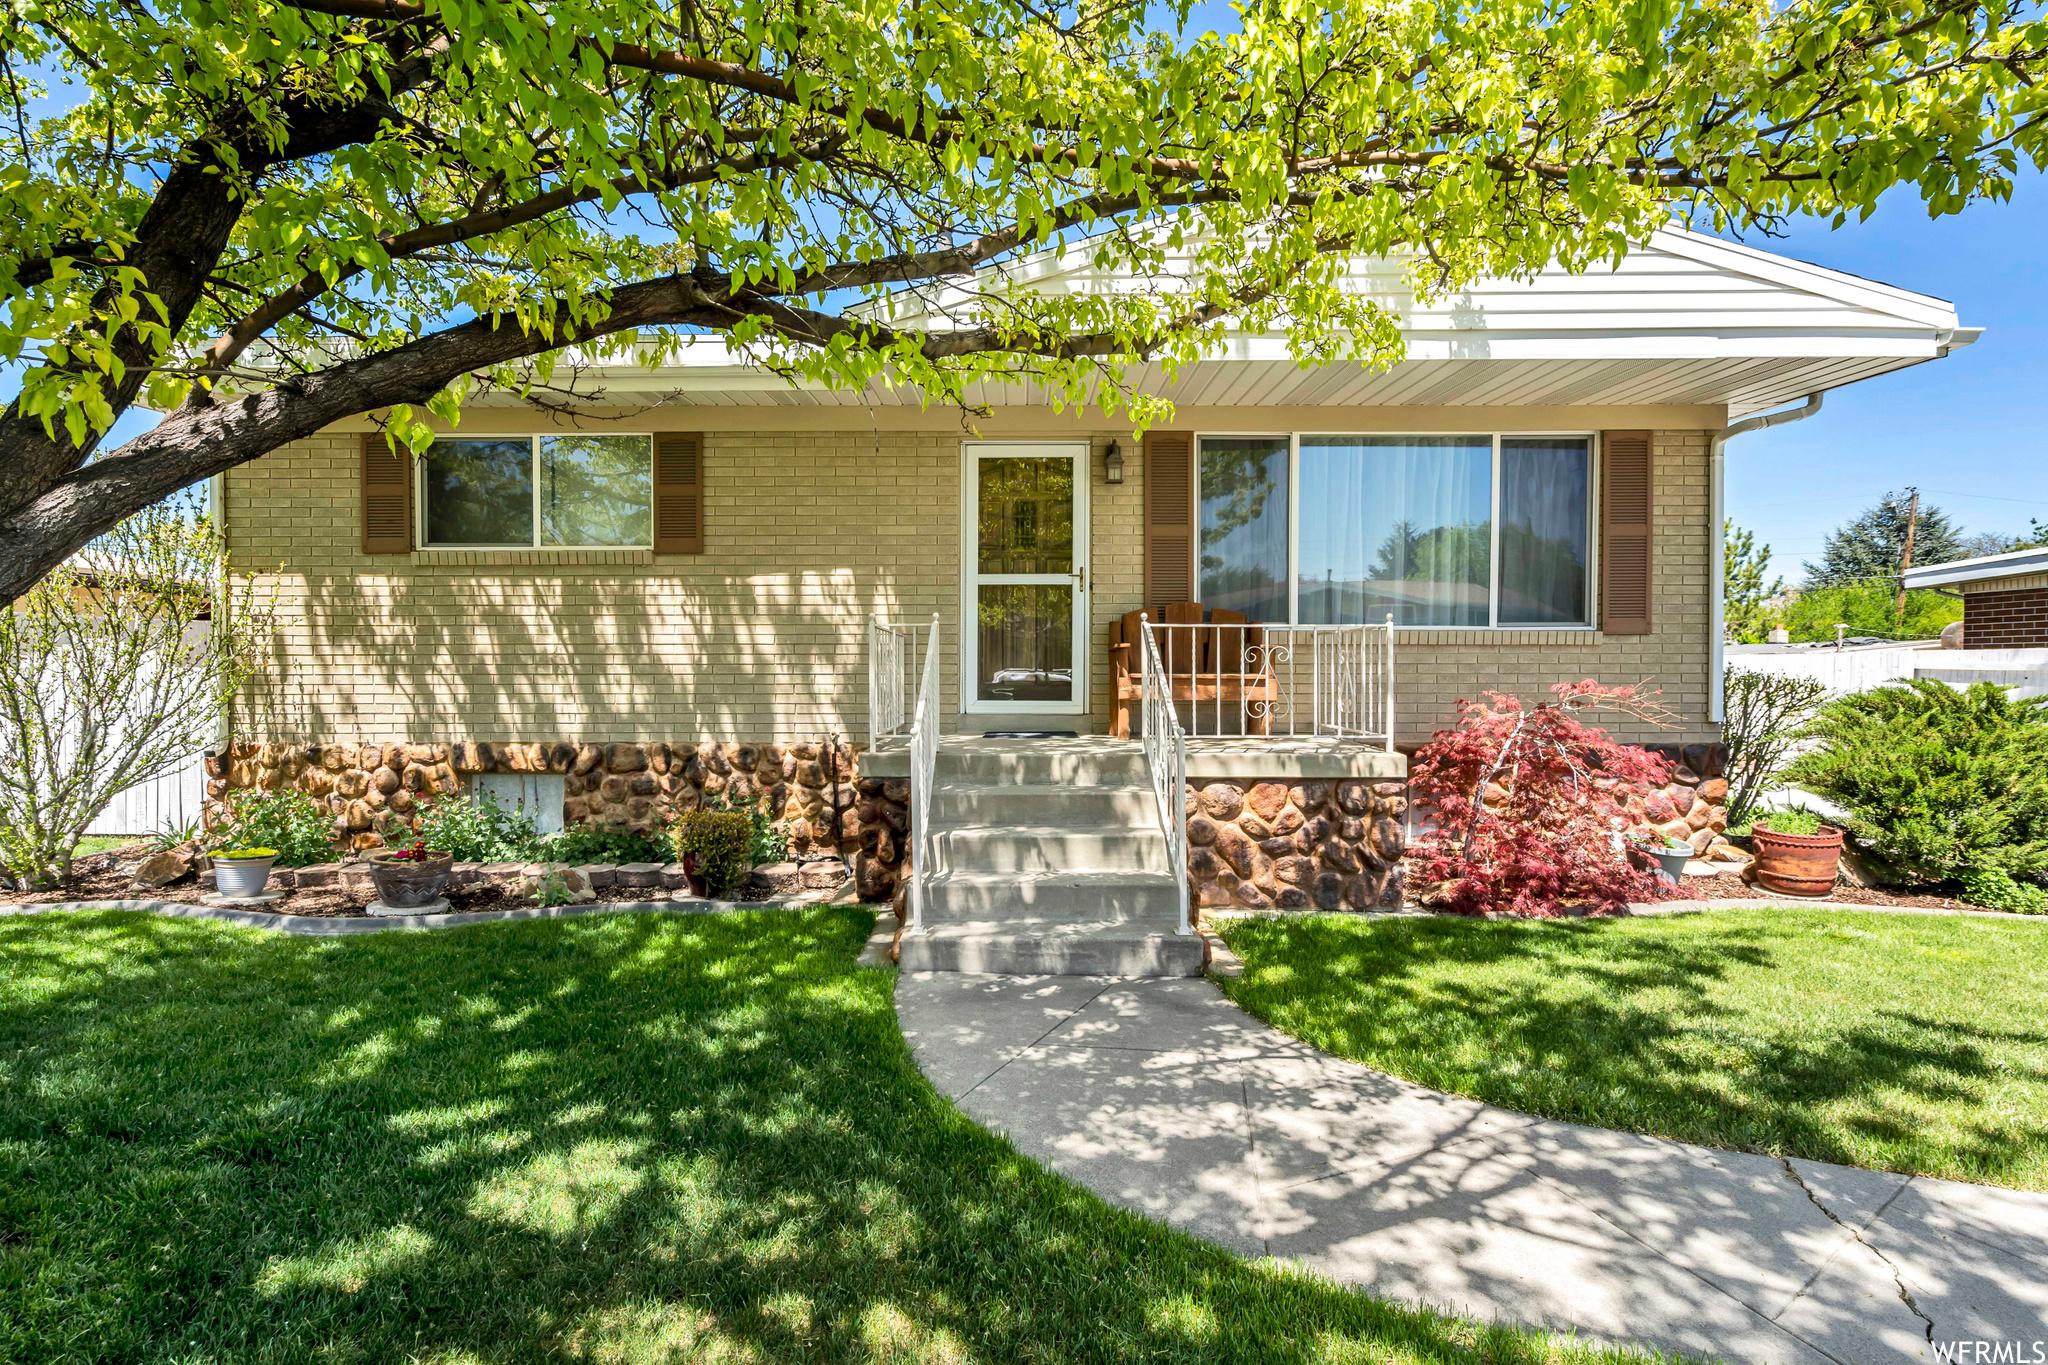 1630 W LELAND DR, West Jordan, Utah 84084, 4 Bedrooms Bedrooms, ,1 BathroomBathrooms,Single Family,For Sale,1630 W LELAND DR,1740533